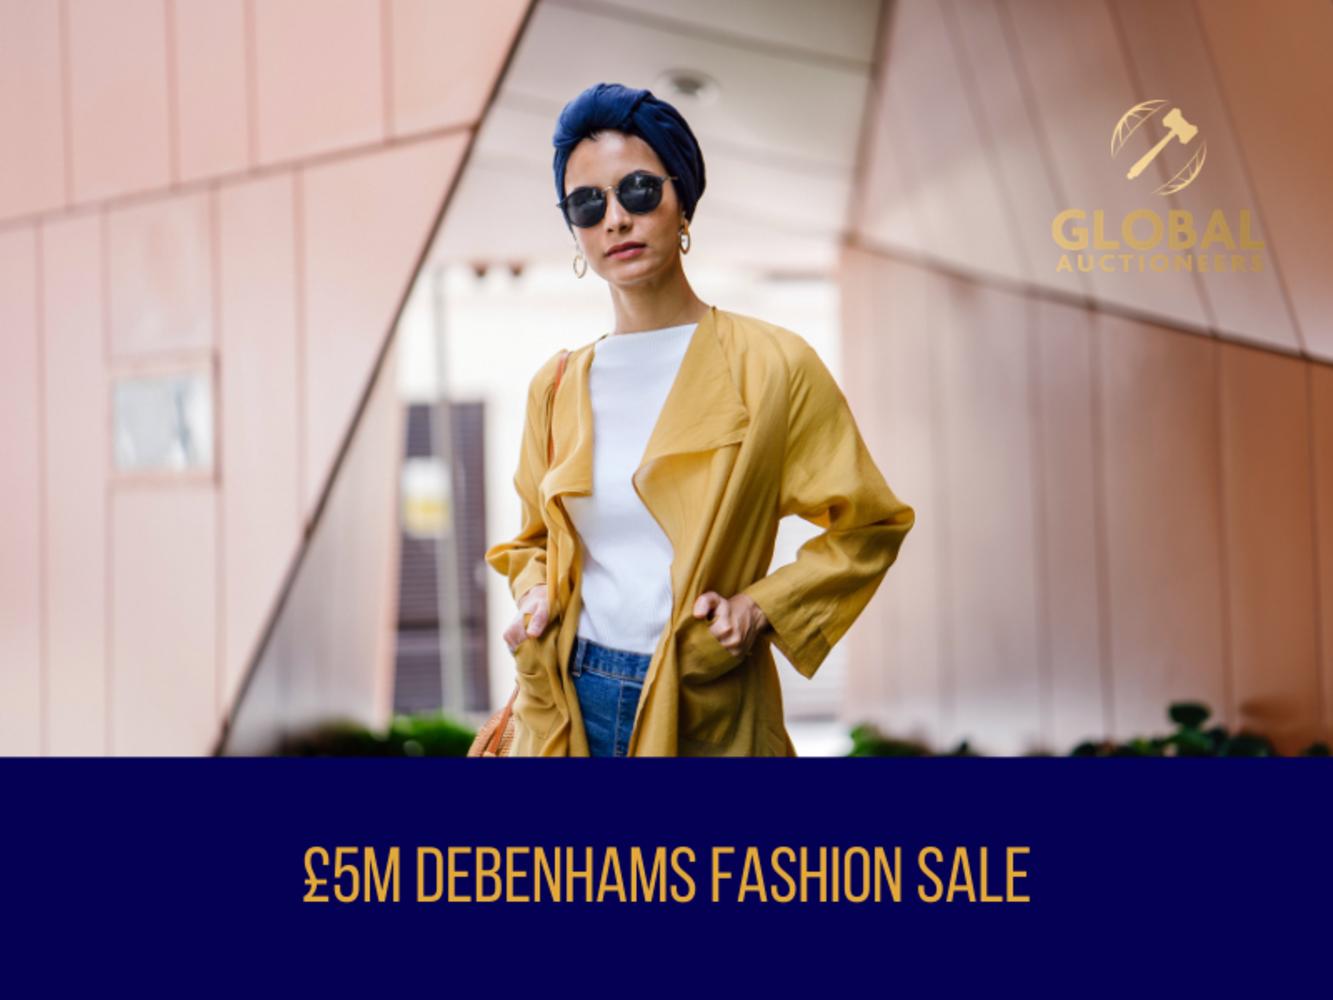 The £5m Debenhams Mega Fashion Sale - 26th March 2021